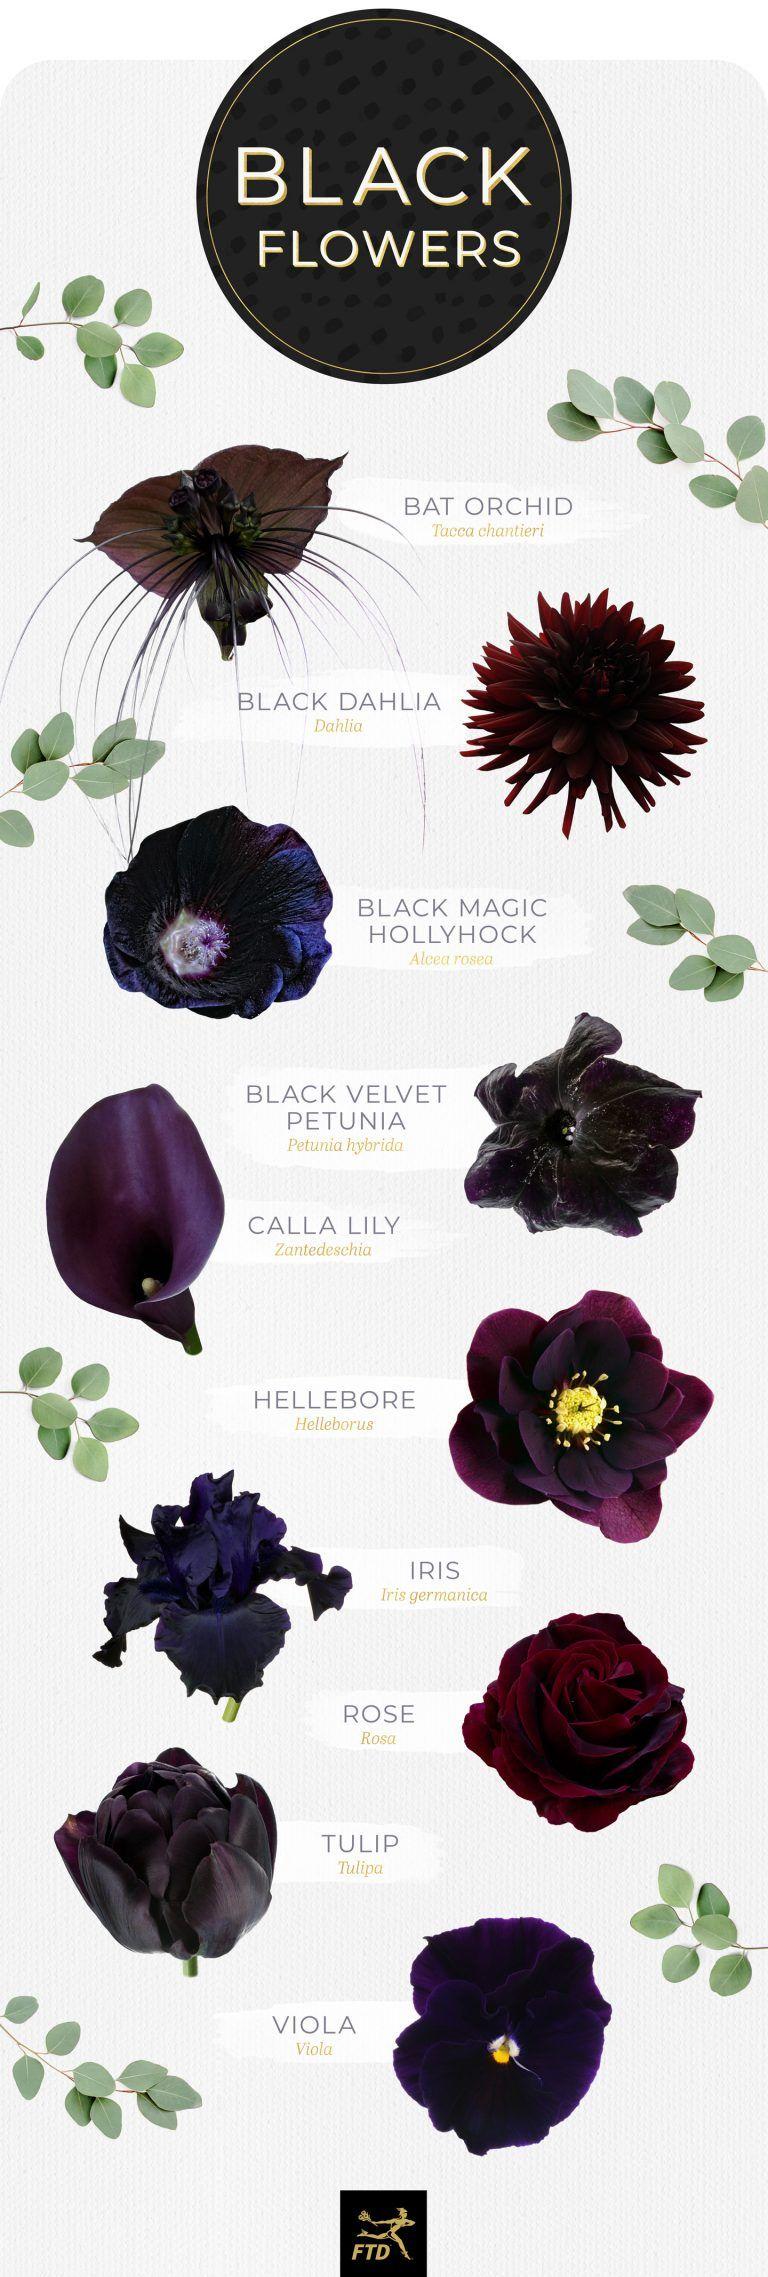 10 Types of Black Flowers Black flowers, Gothic flowers